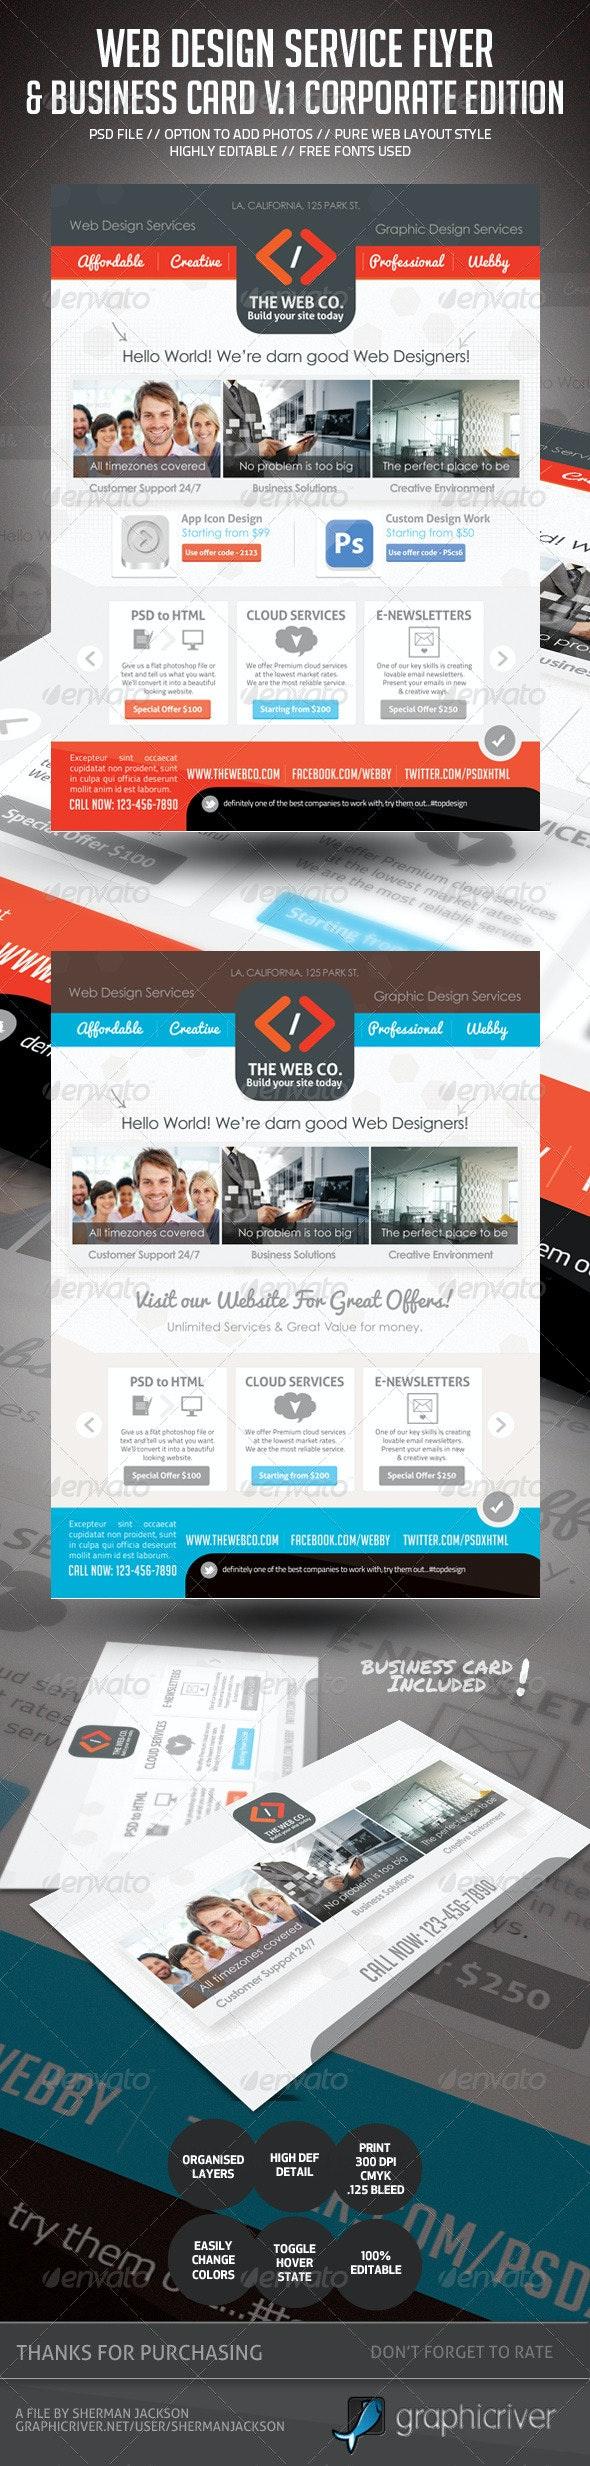 Web Design Service Set - 1 (Flyer & Business Card) - Commerce Flyers